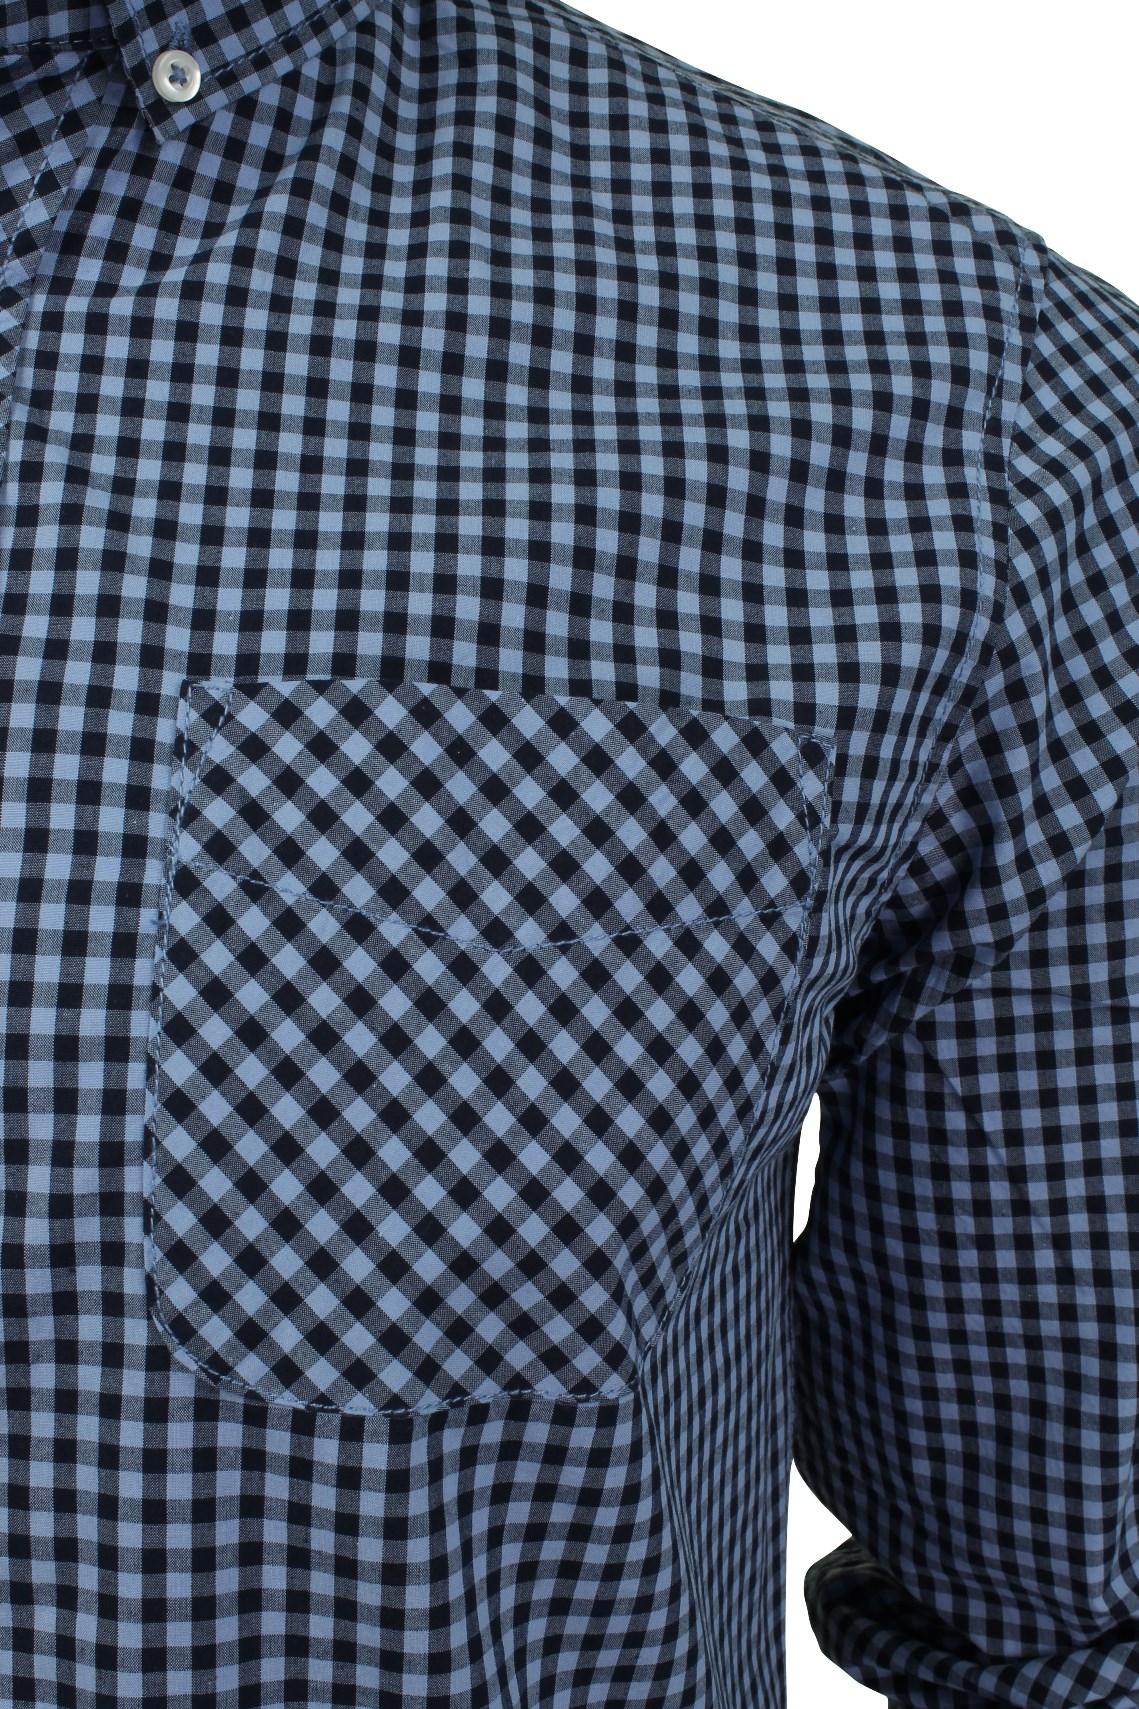 Mens-Gingham-Check-Shirt-by-Tokyo-Laundry-039-Newick-039-Long-Sleeved thumbnail 7